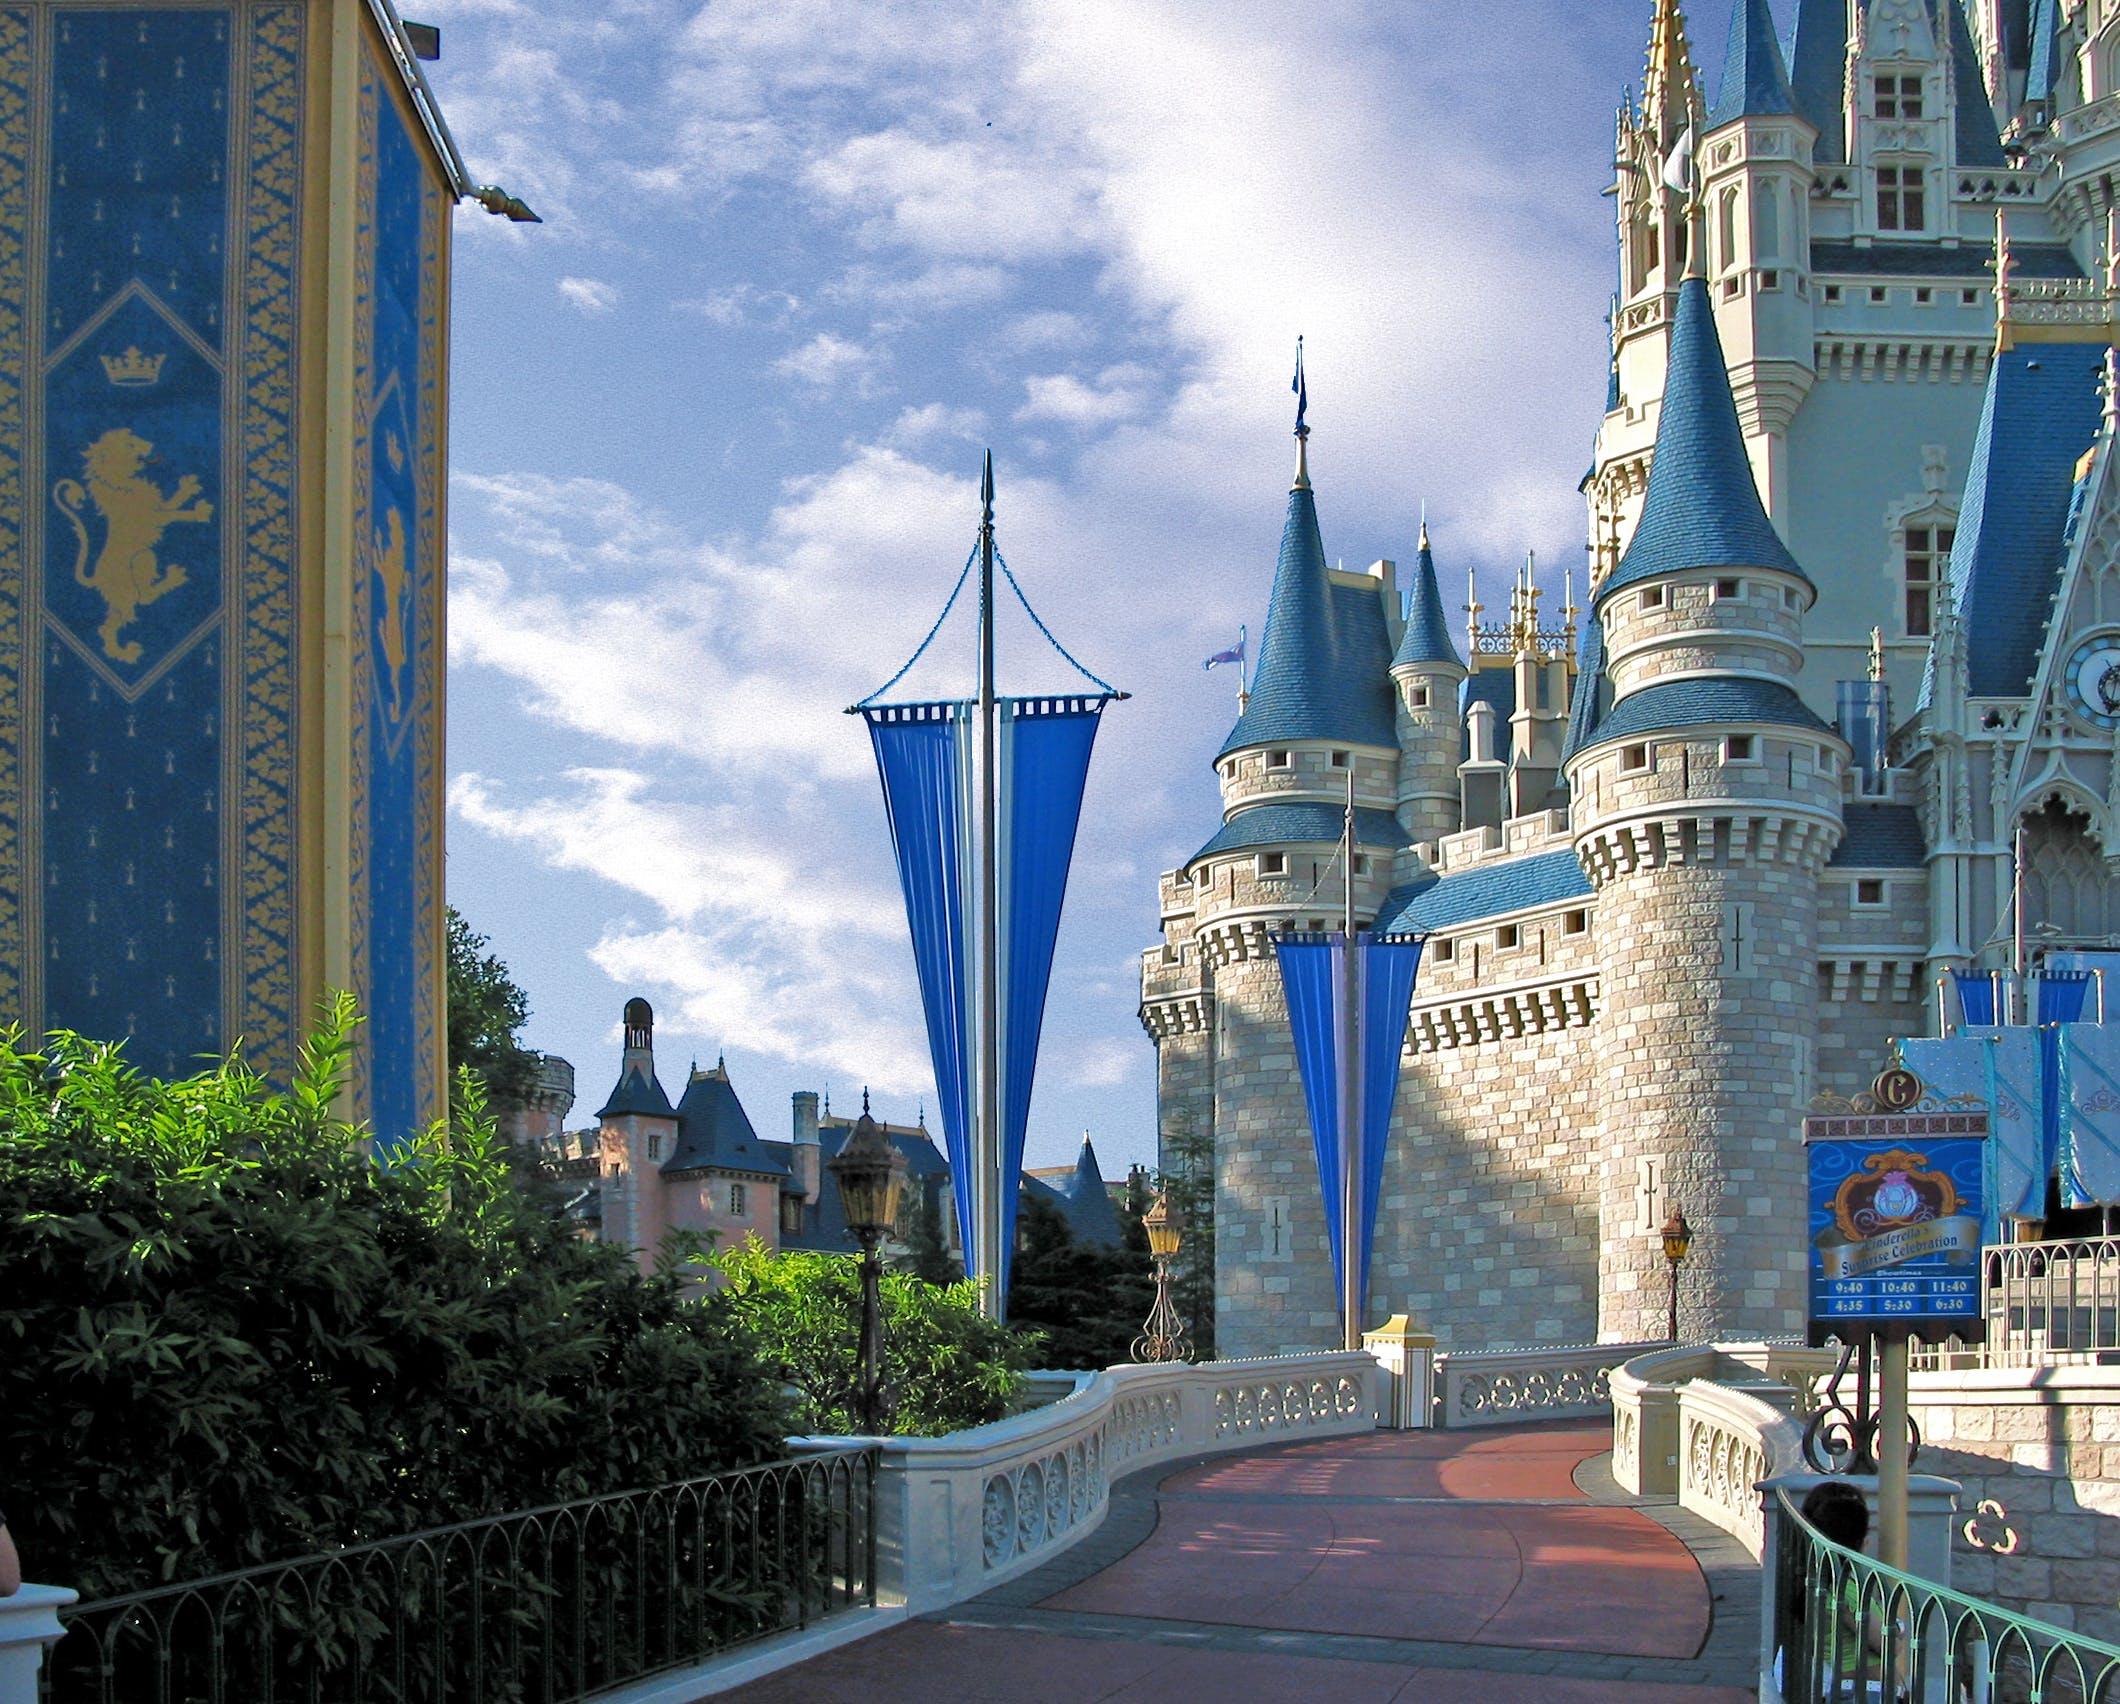 Free stock photo of cinderella's castle, disneyworld, orlando